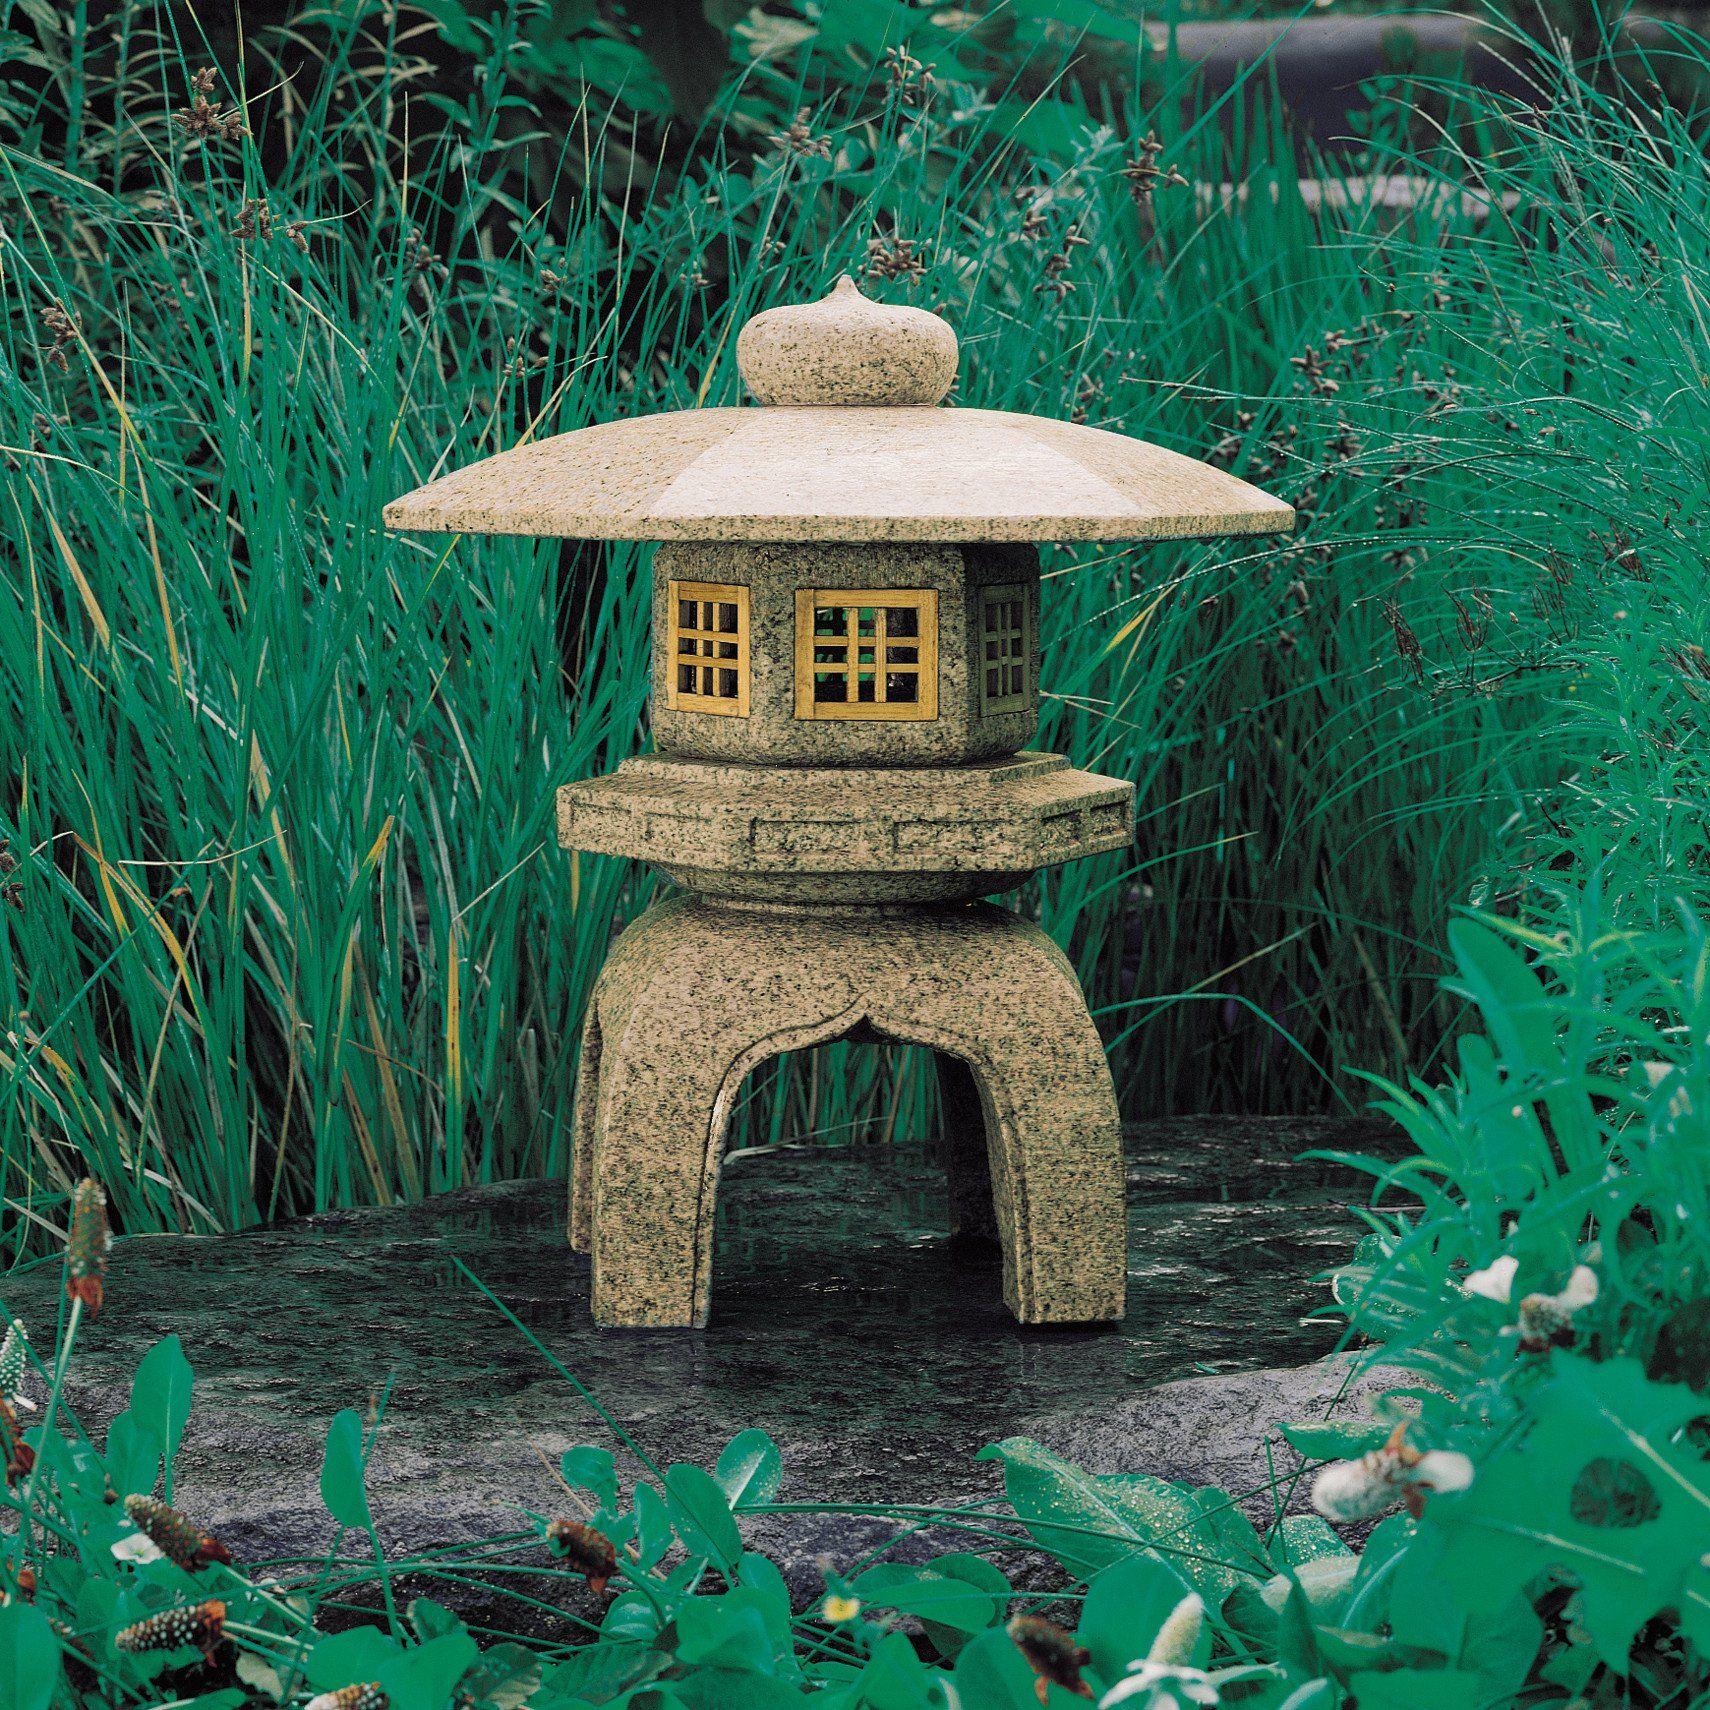 Antique Yukimi Lantern Japanese Stone Lanterns Stone Forest Jardin Zen Japonais Jardin Japonais Jardin D Eau